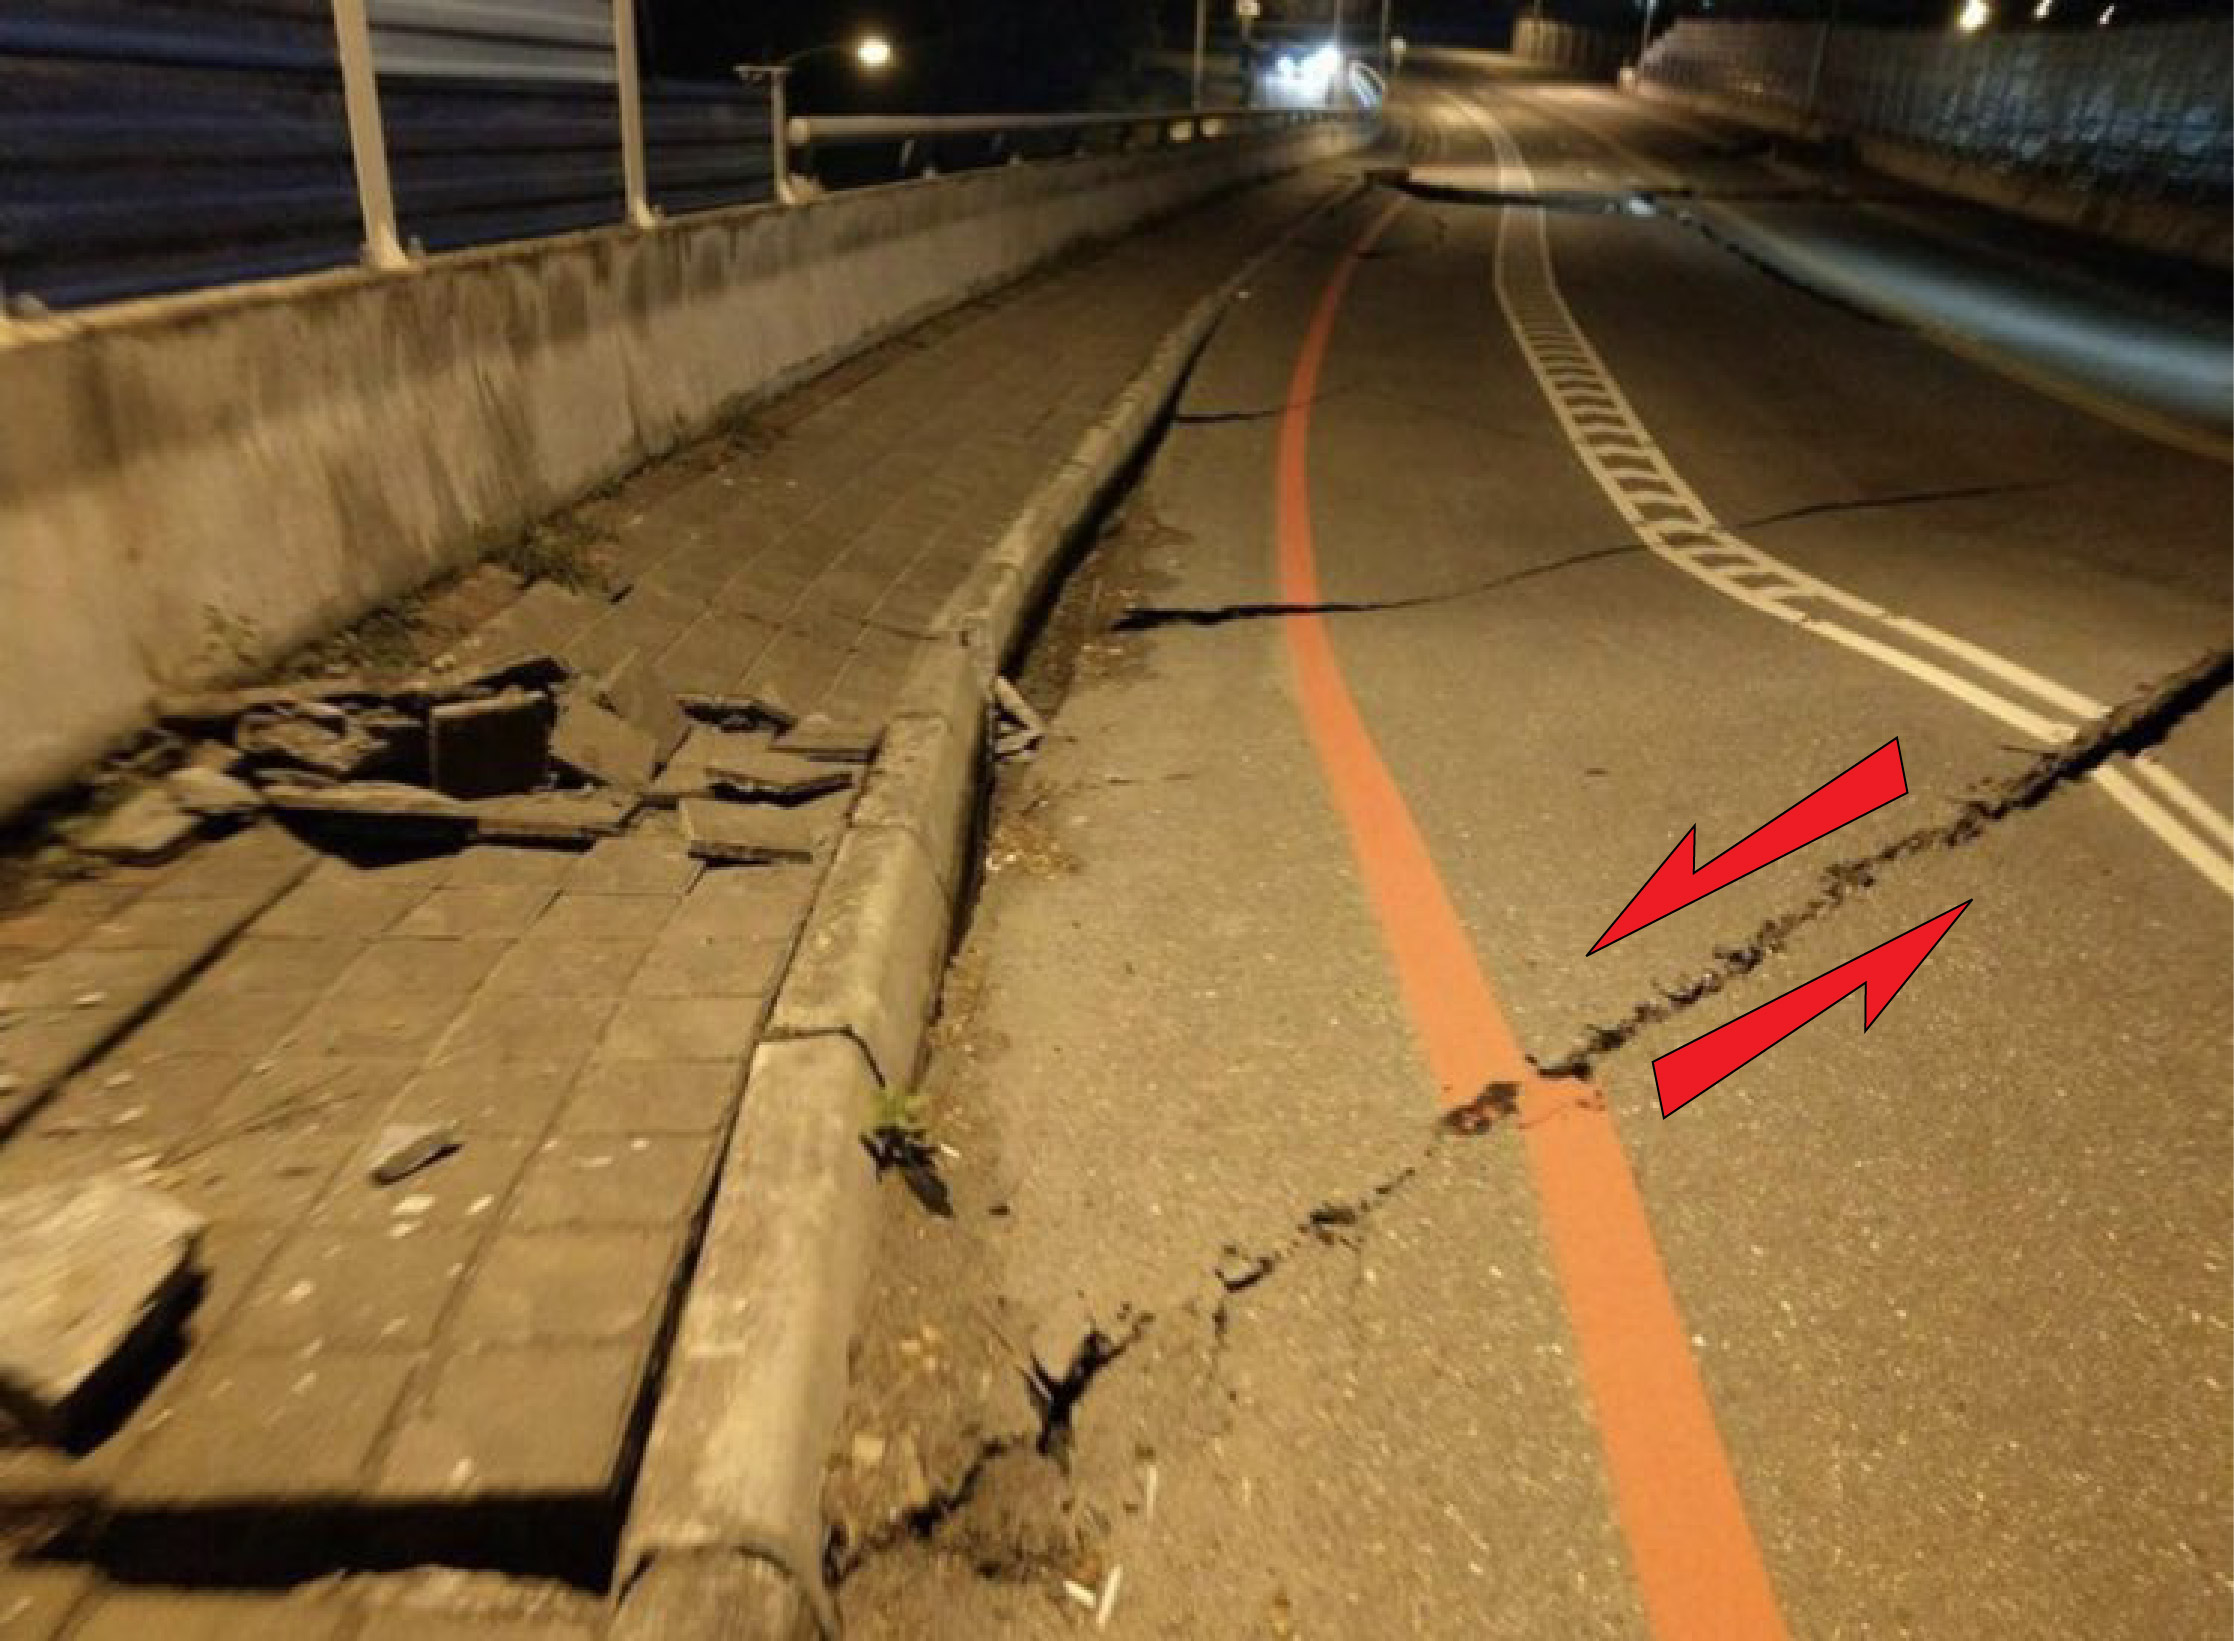 buckled-roads-strike-slip